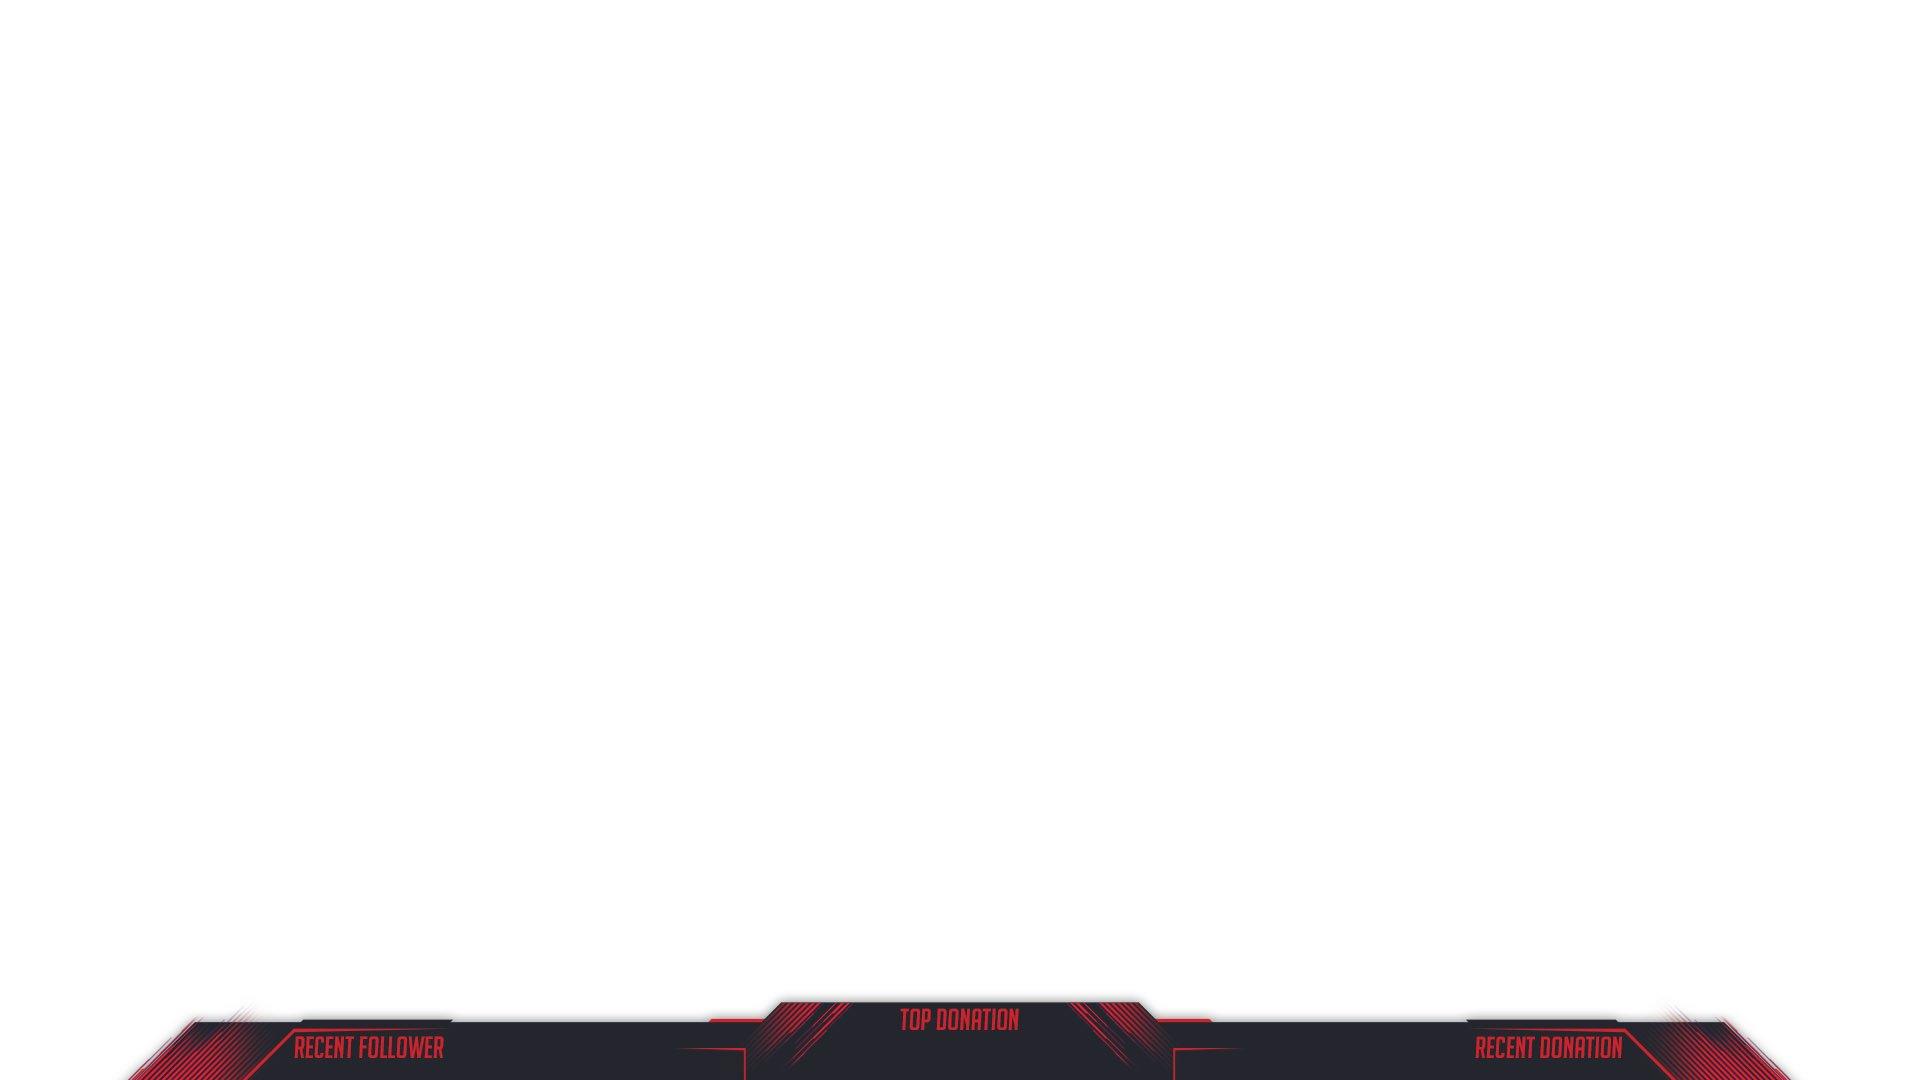 fifa overlay